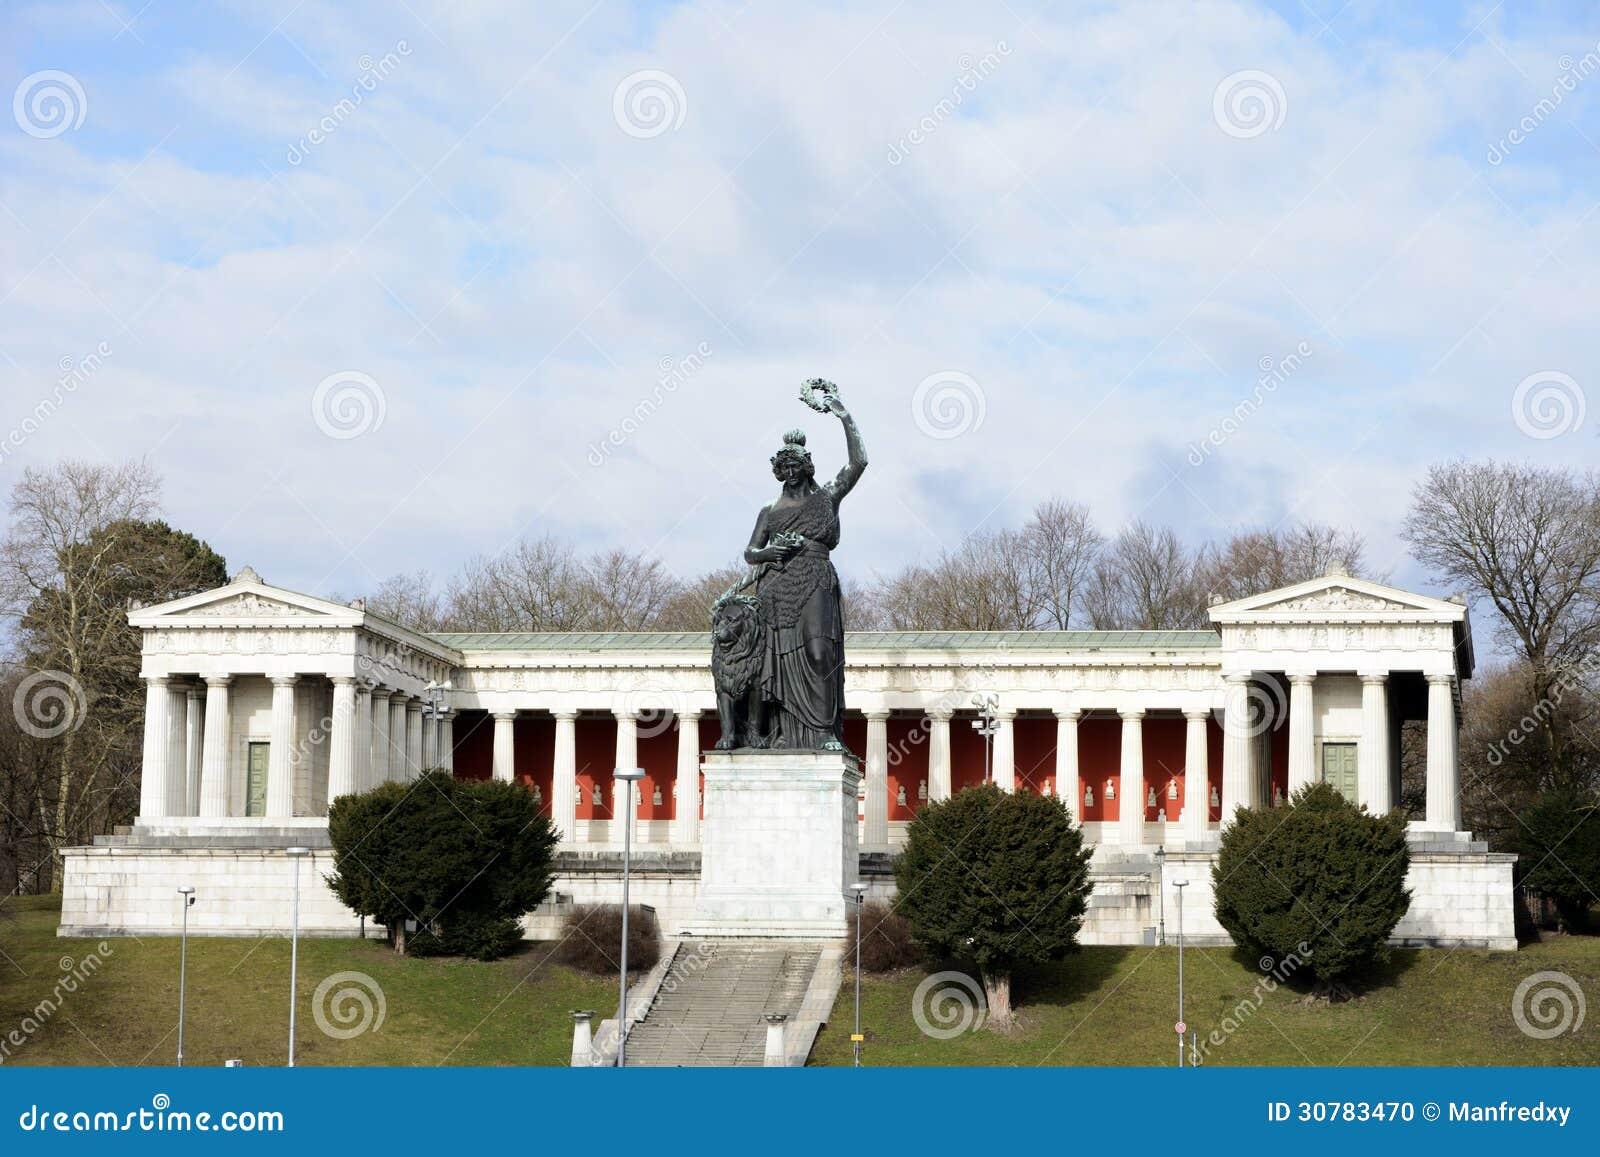 Bavaria Statue Stock Photo - Image: 30783470